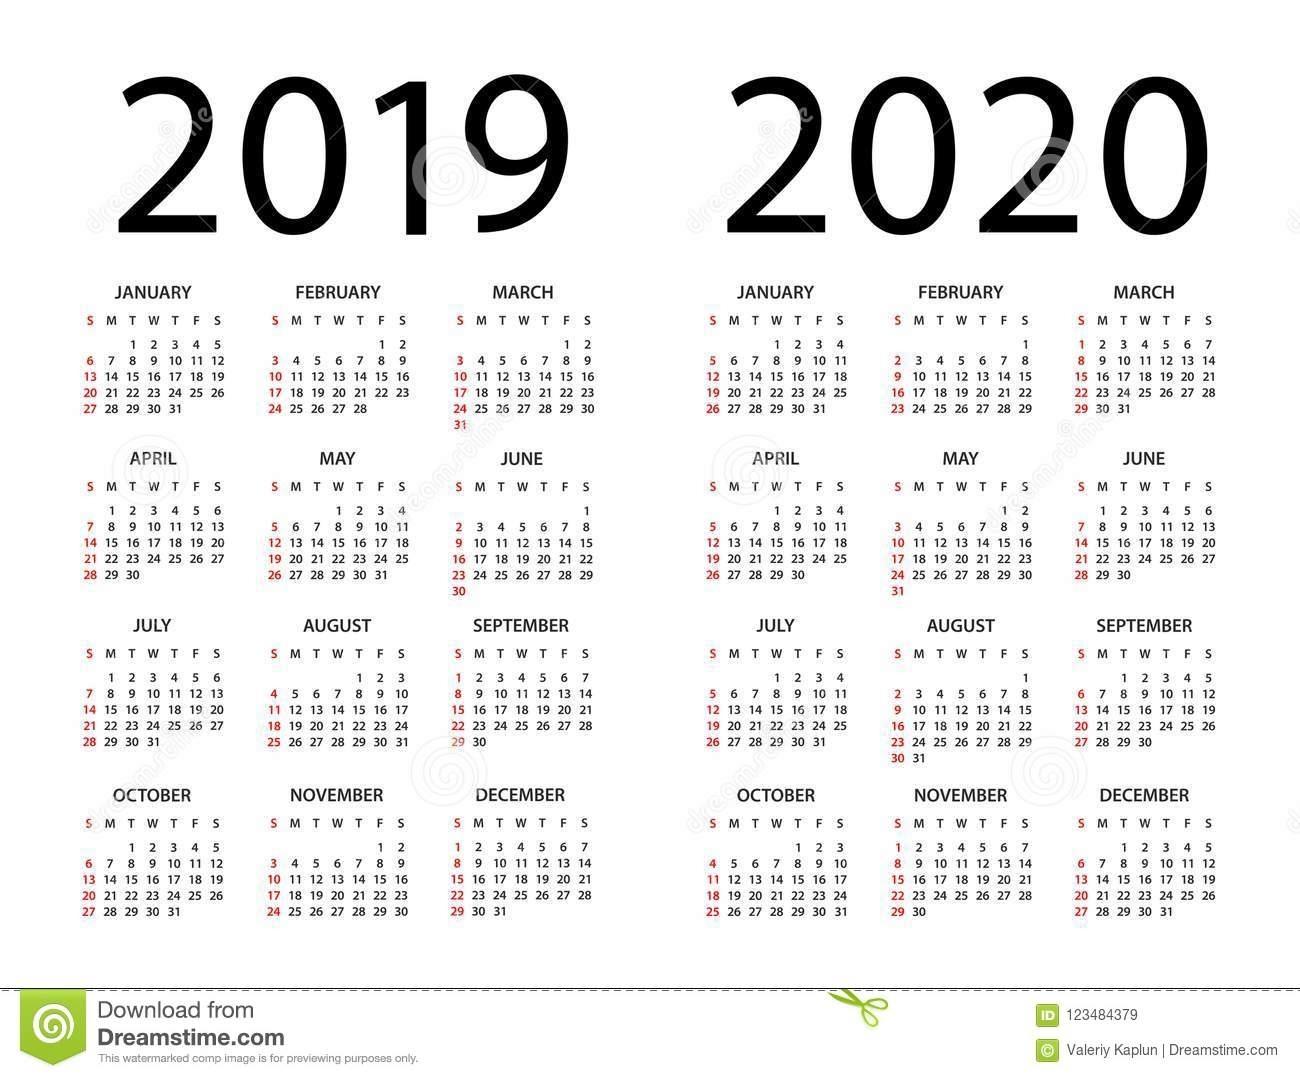 Calendar 2019 2020 - Illustration. Week Starts On Sunday Stock inside 2019-2020 Calendar Starting On Mondays